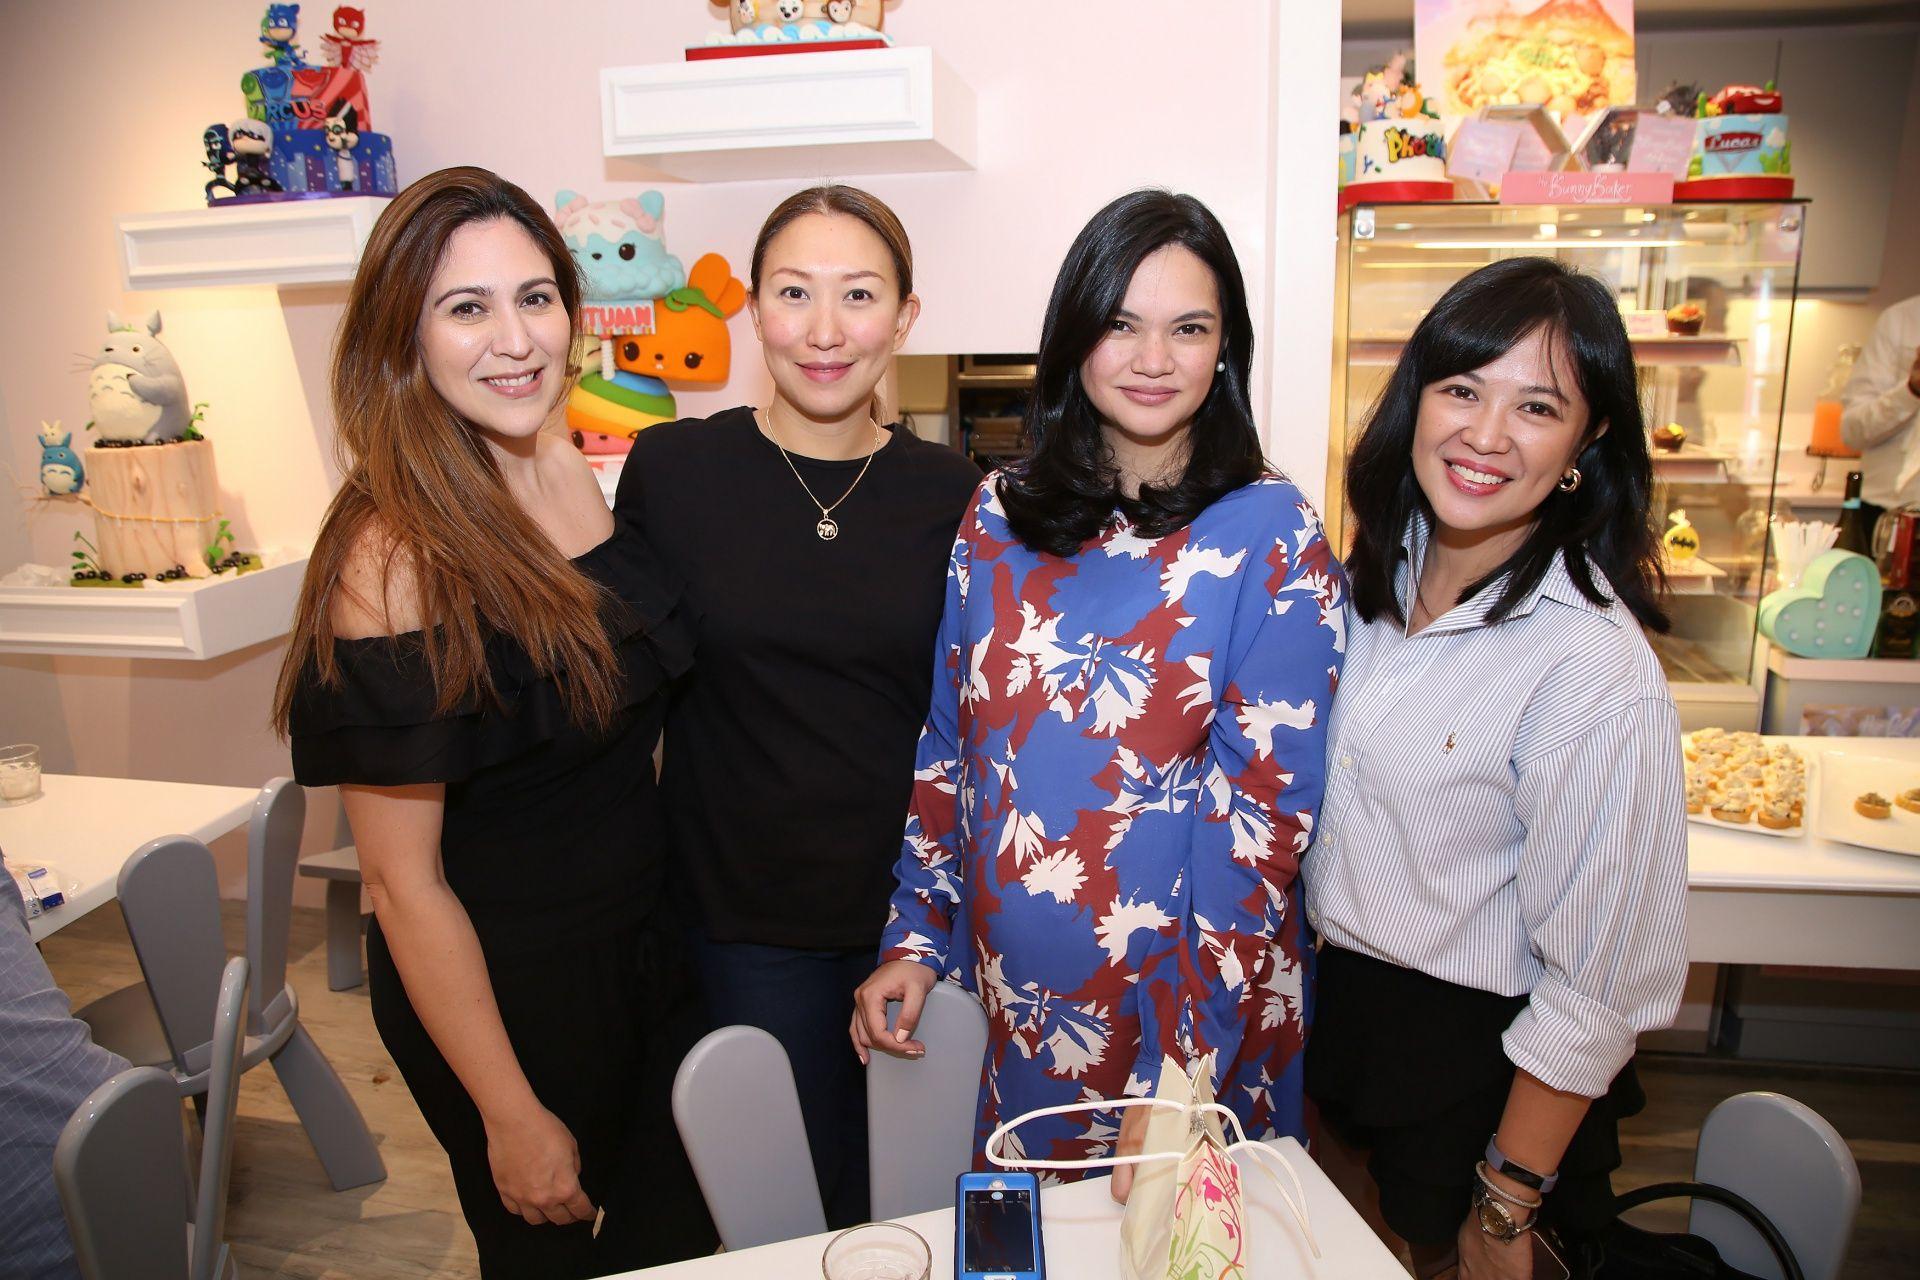 Amaya Barretto, Lisa Capito, Sophie Villanueva Solon, Angela Dinglasan